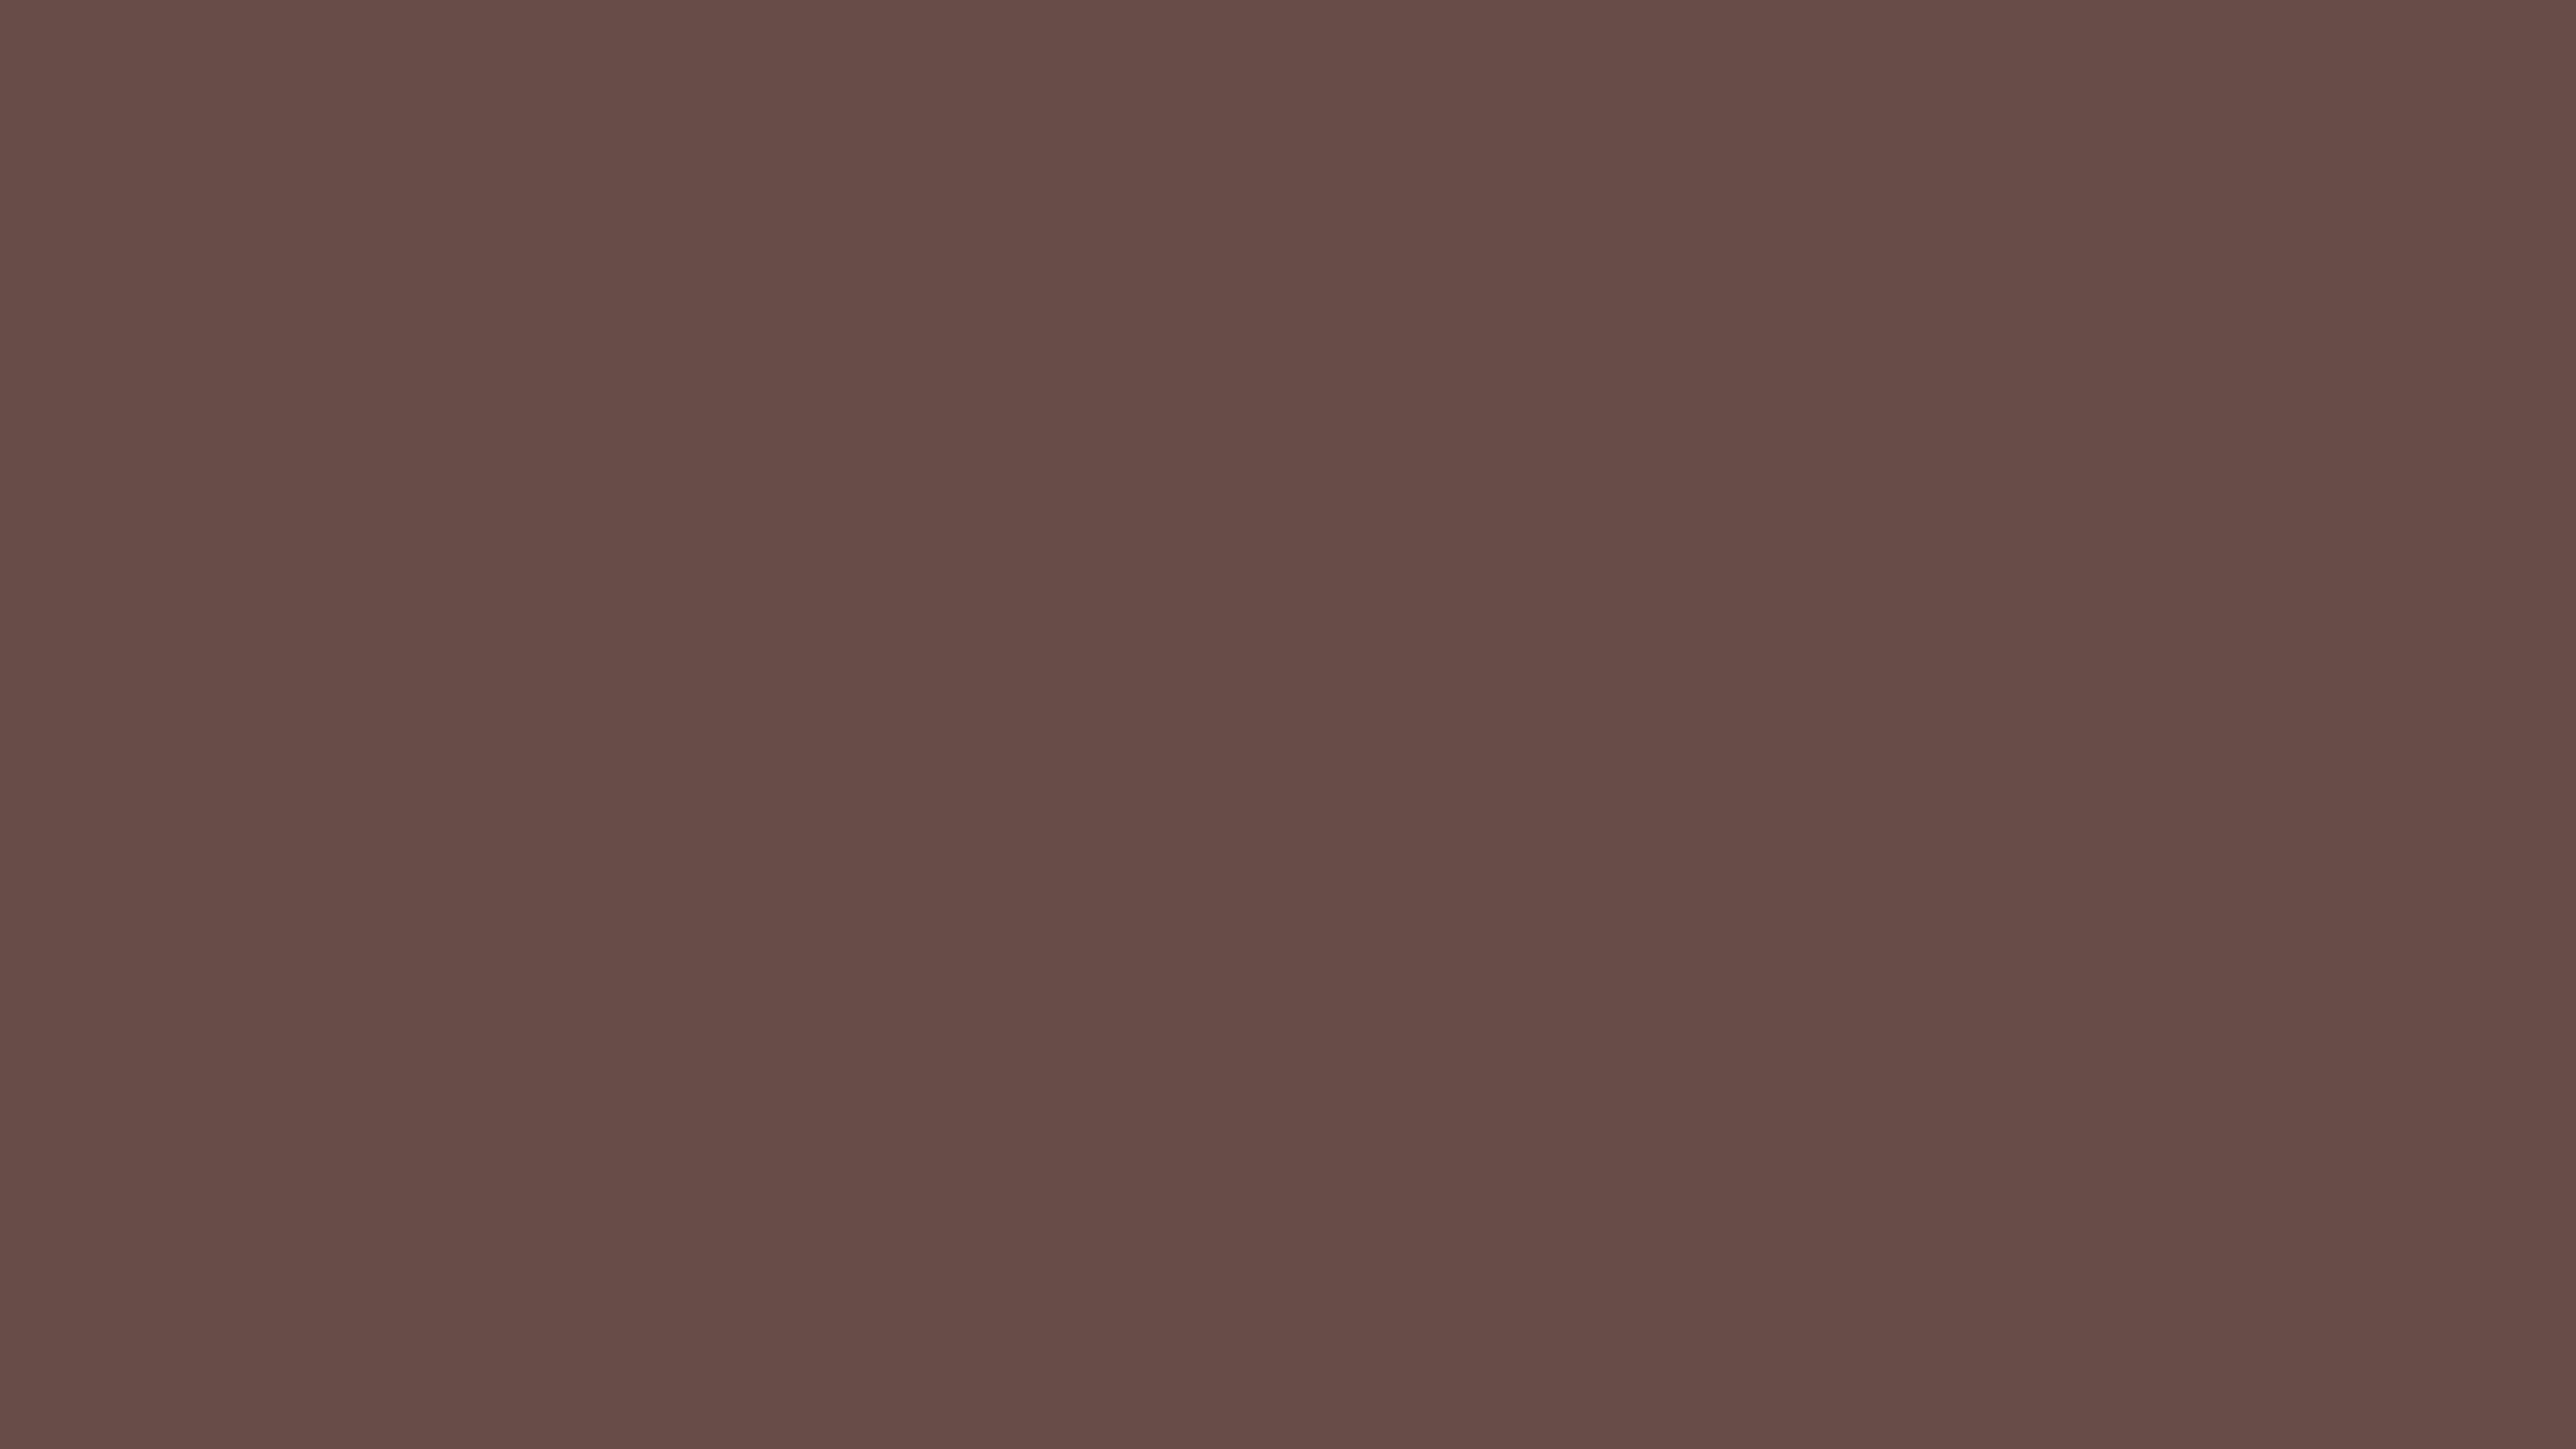 4096x2304 Liver Solid Color Background